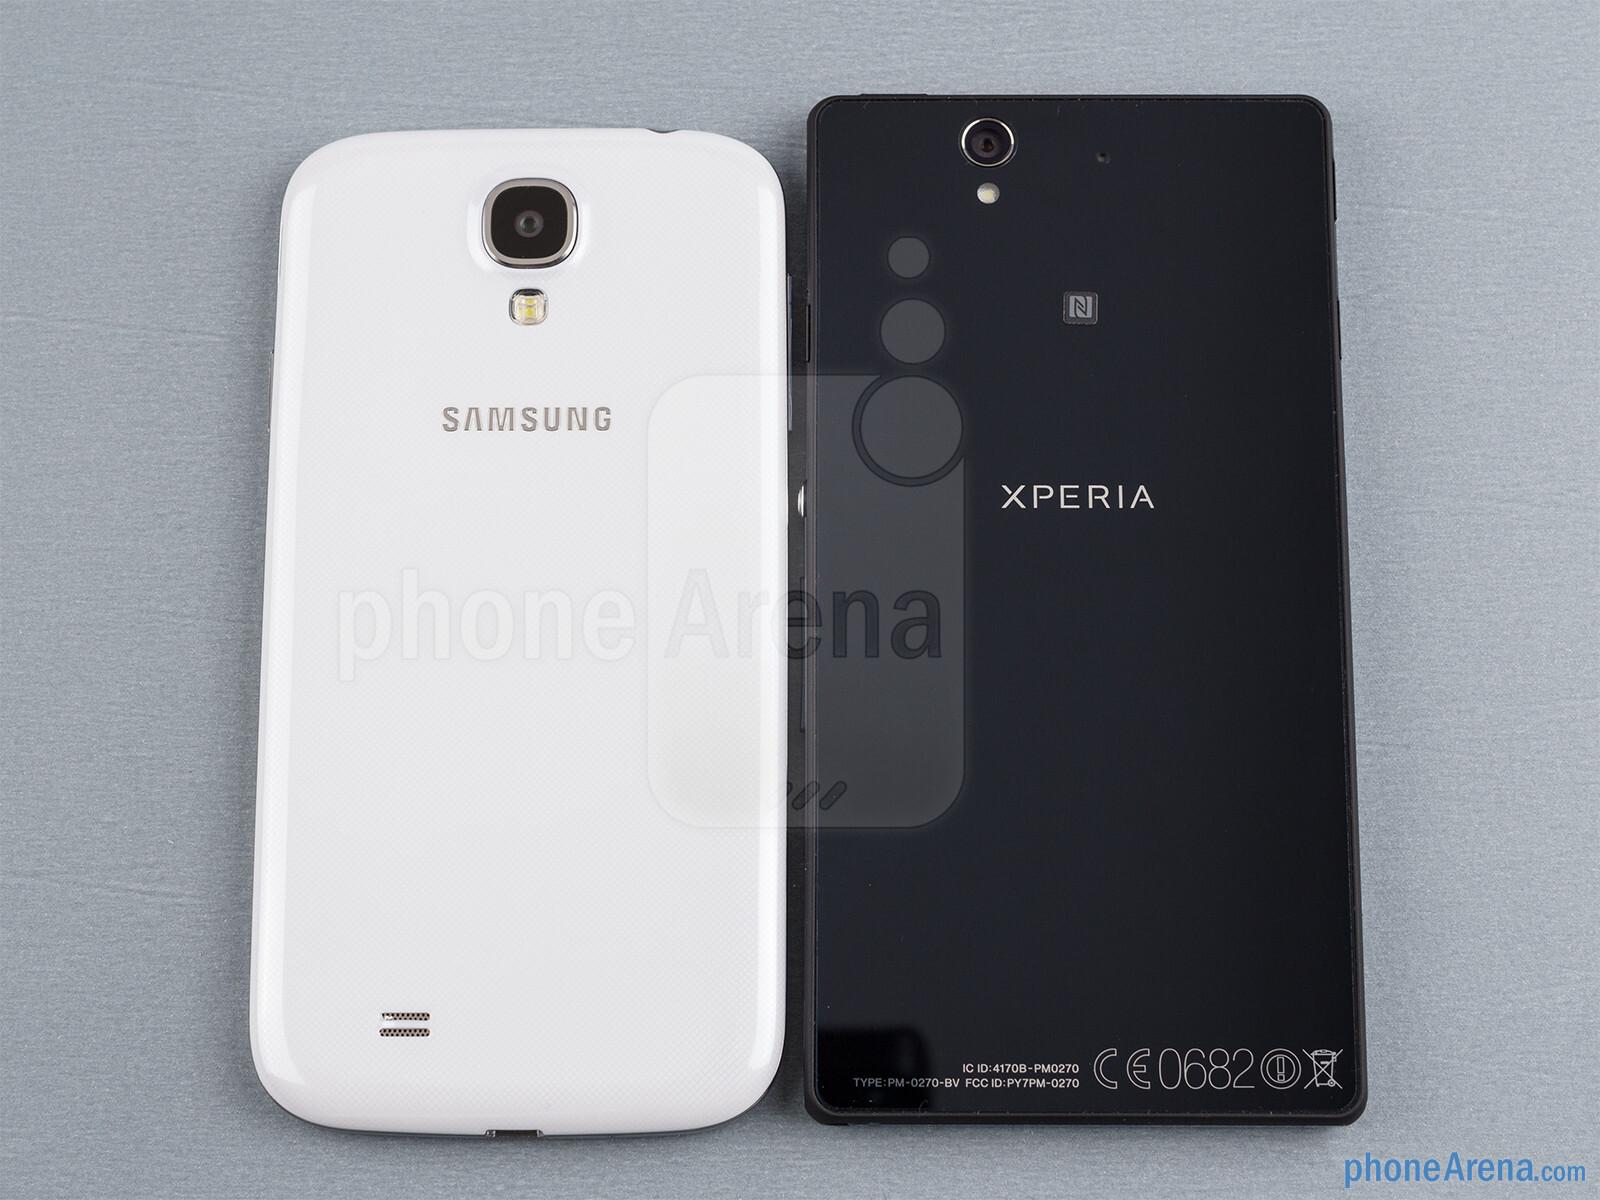 http://i-cdn.phonearena.com/images/reviews/129843-image/Samsung-Galaxy-S4-vs-Sony-Xperia-Z-02.jpg